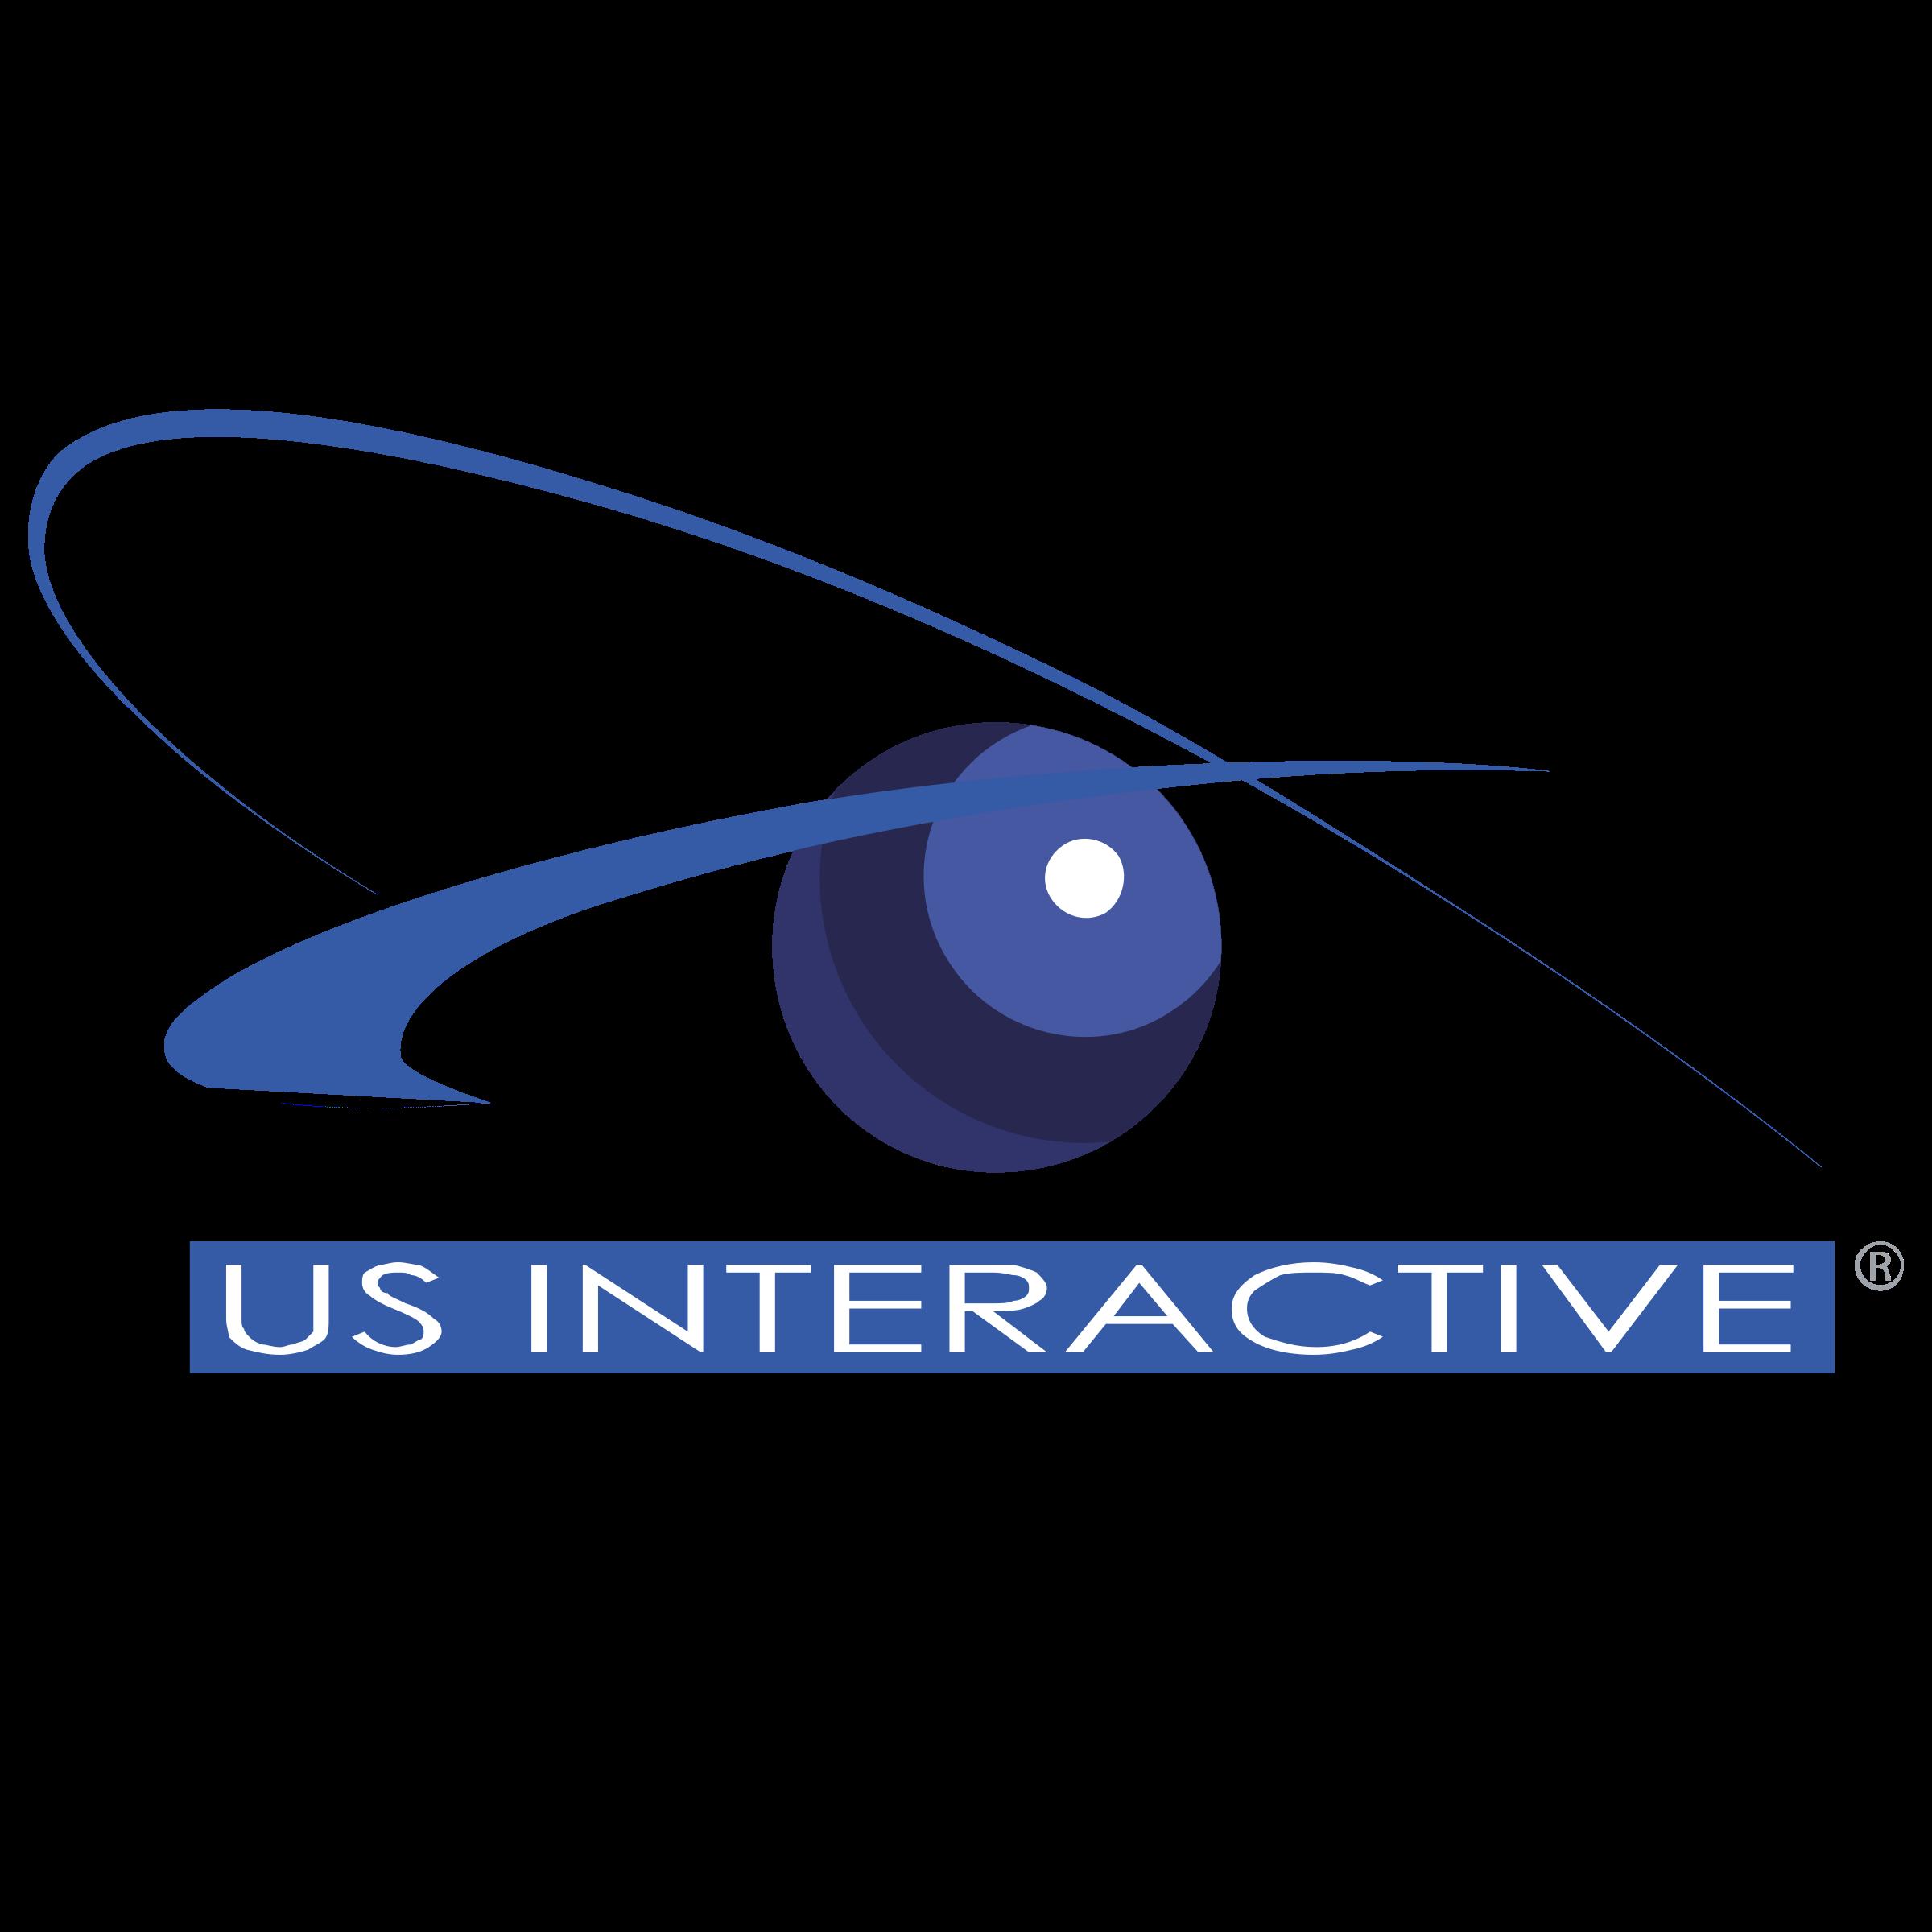 U S Interactive logo